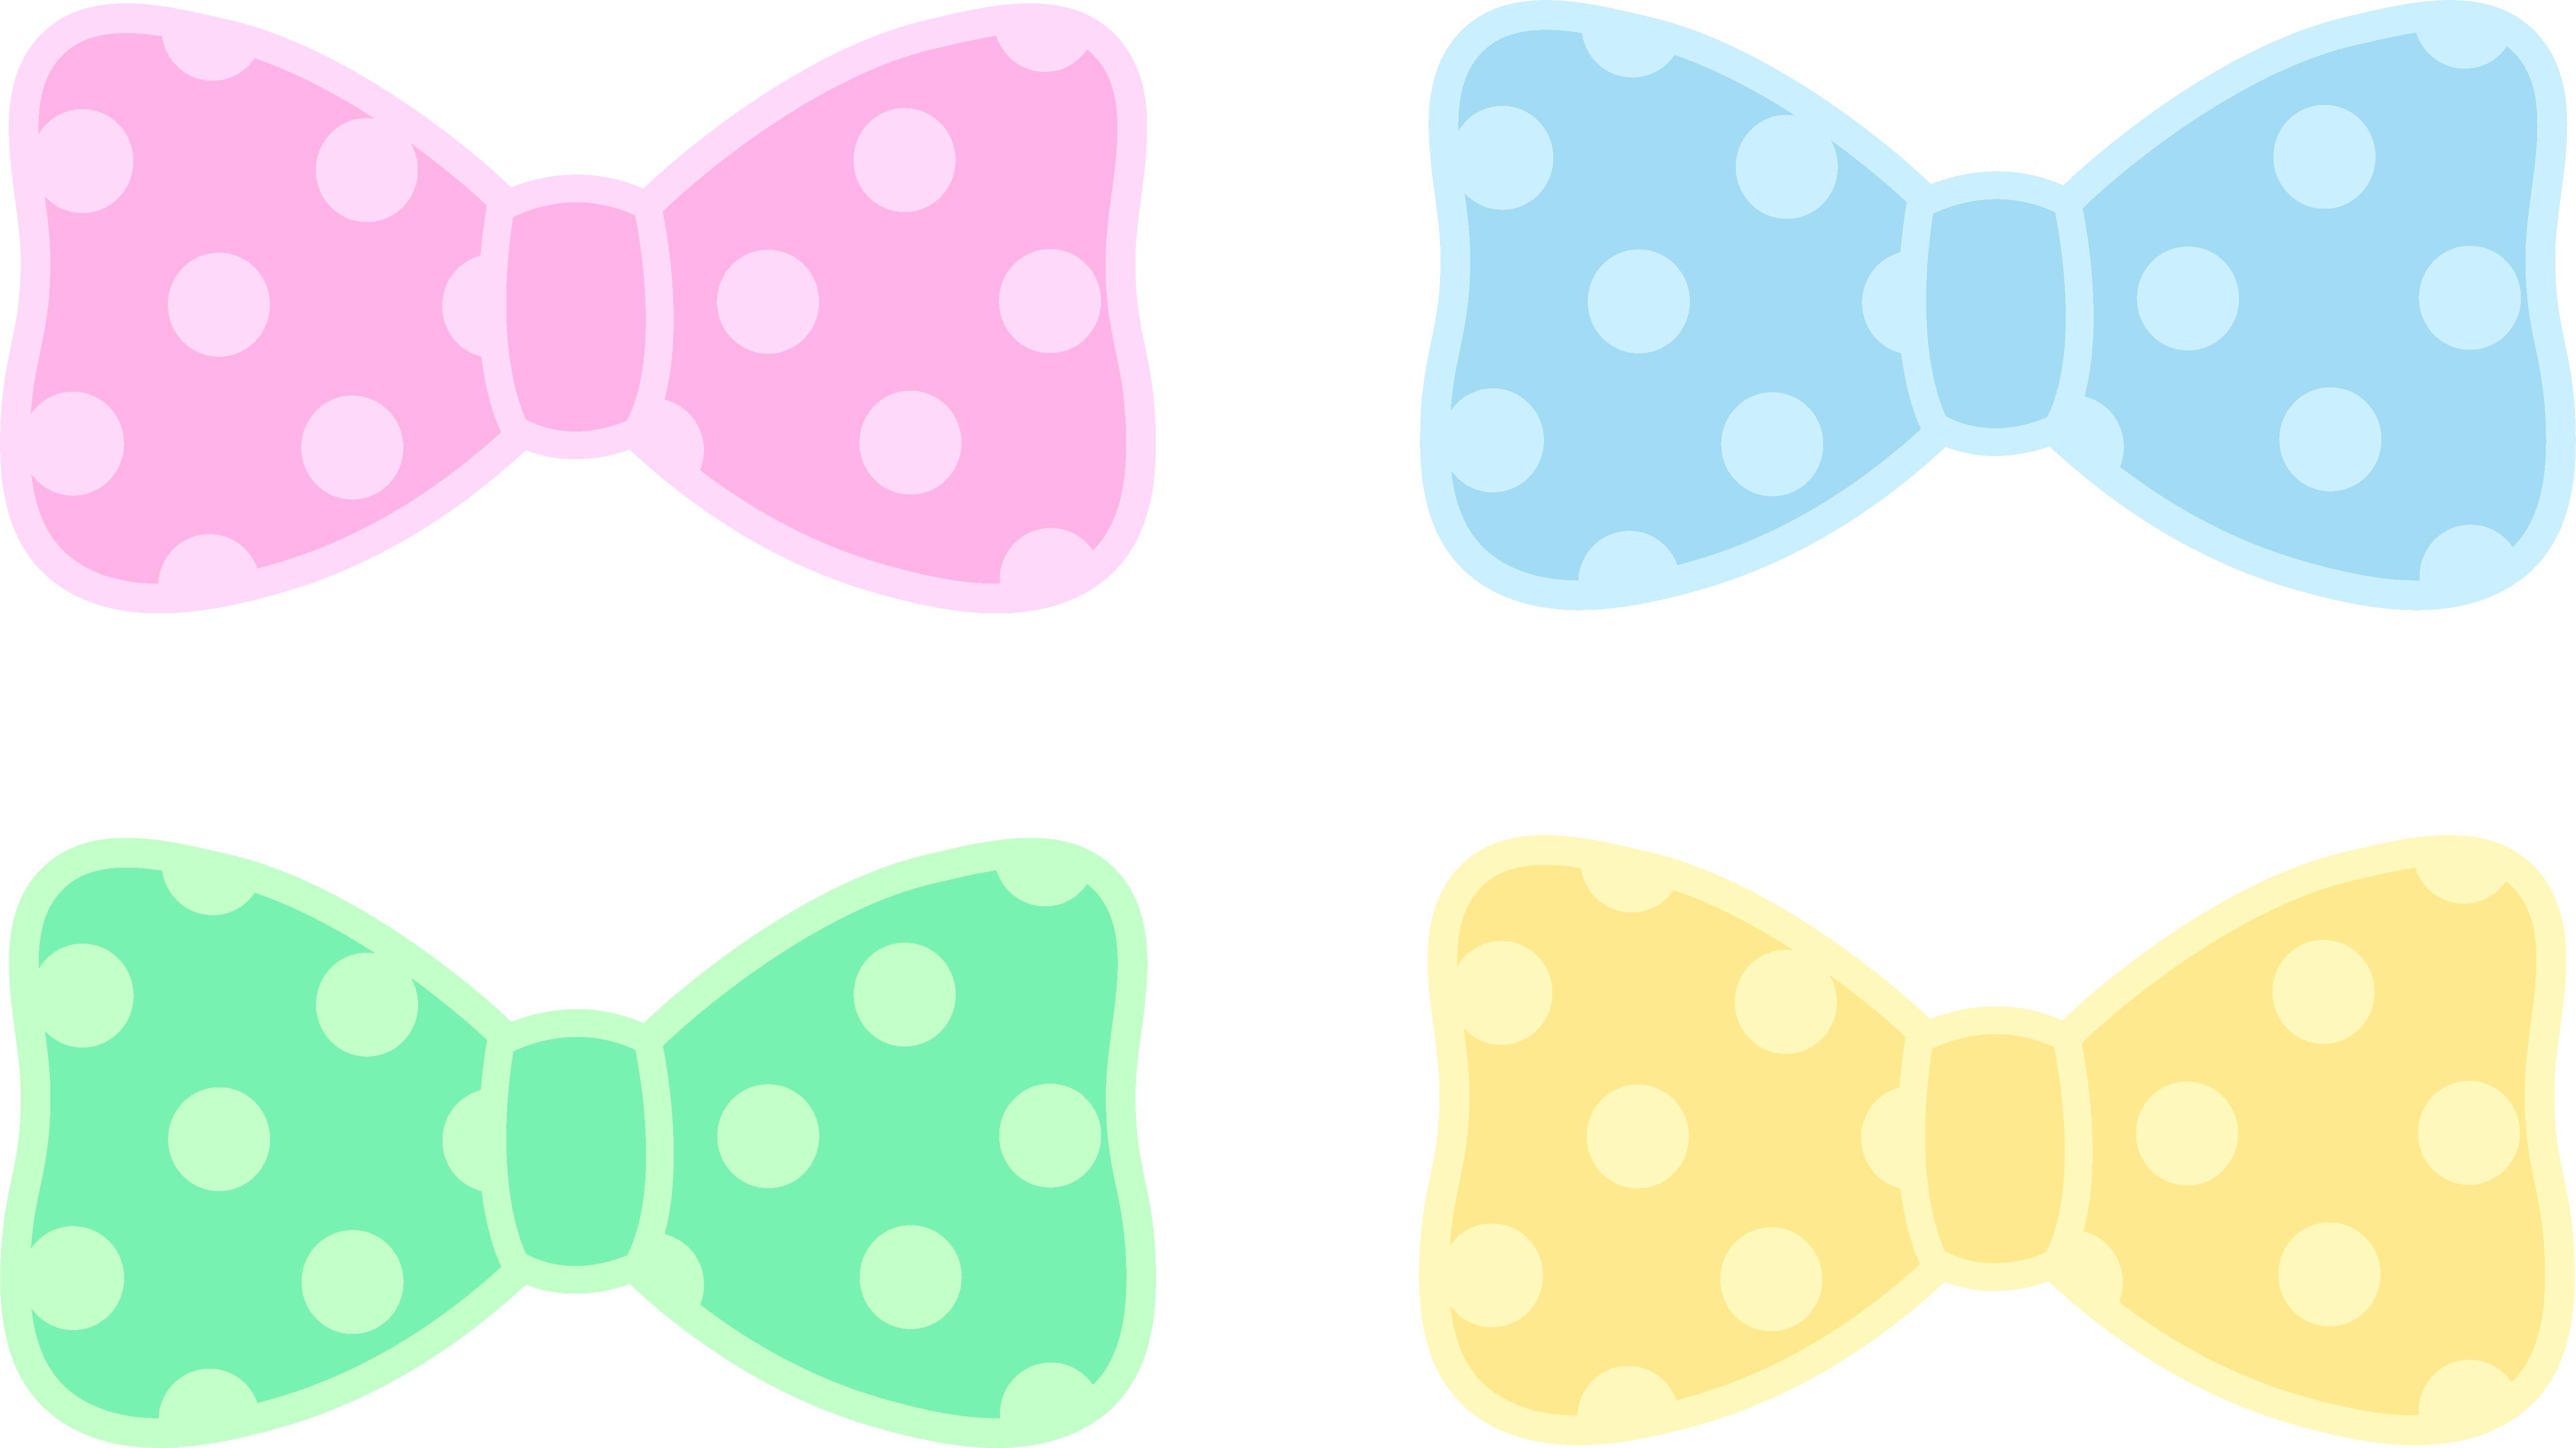 5372x3020 Cute Polka Dot Pastel Bows